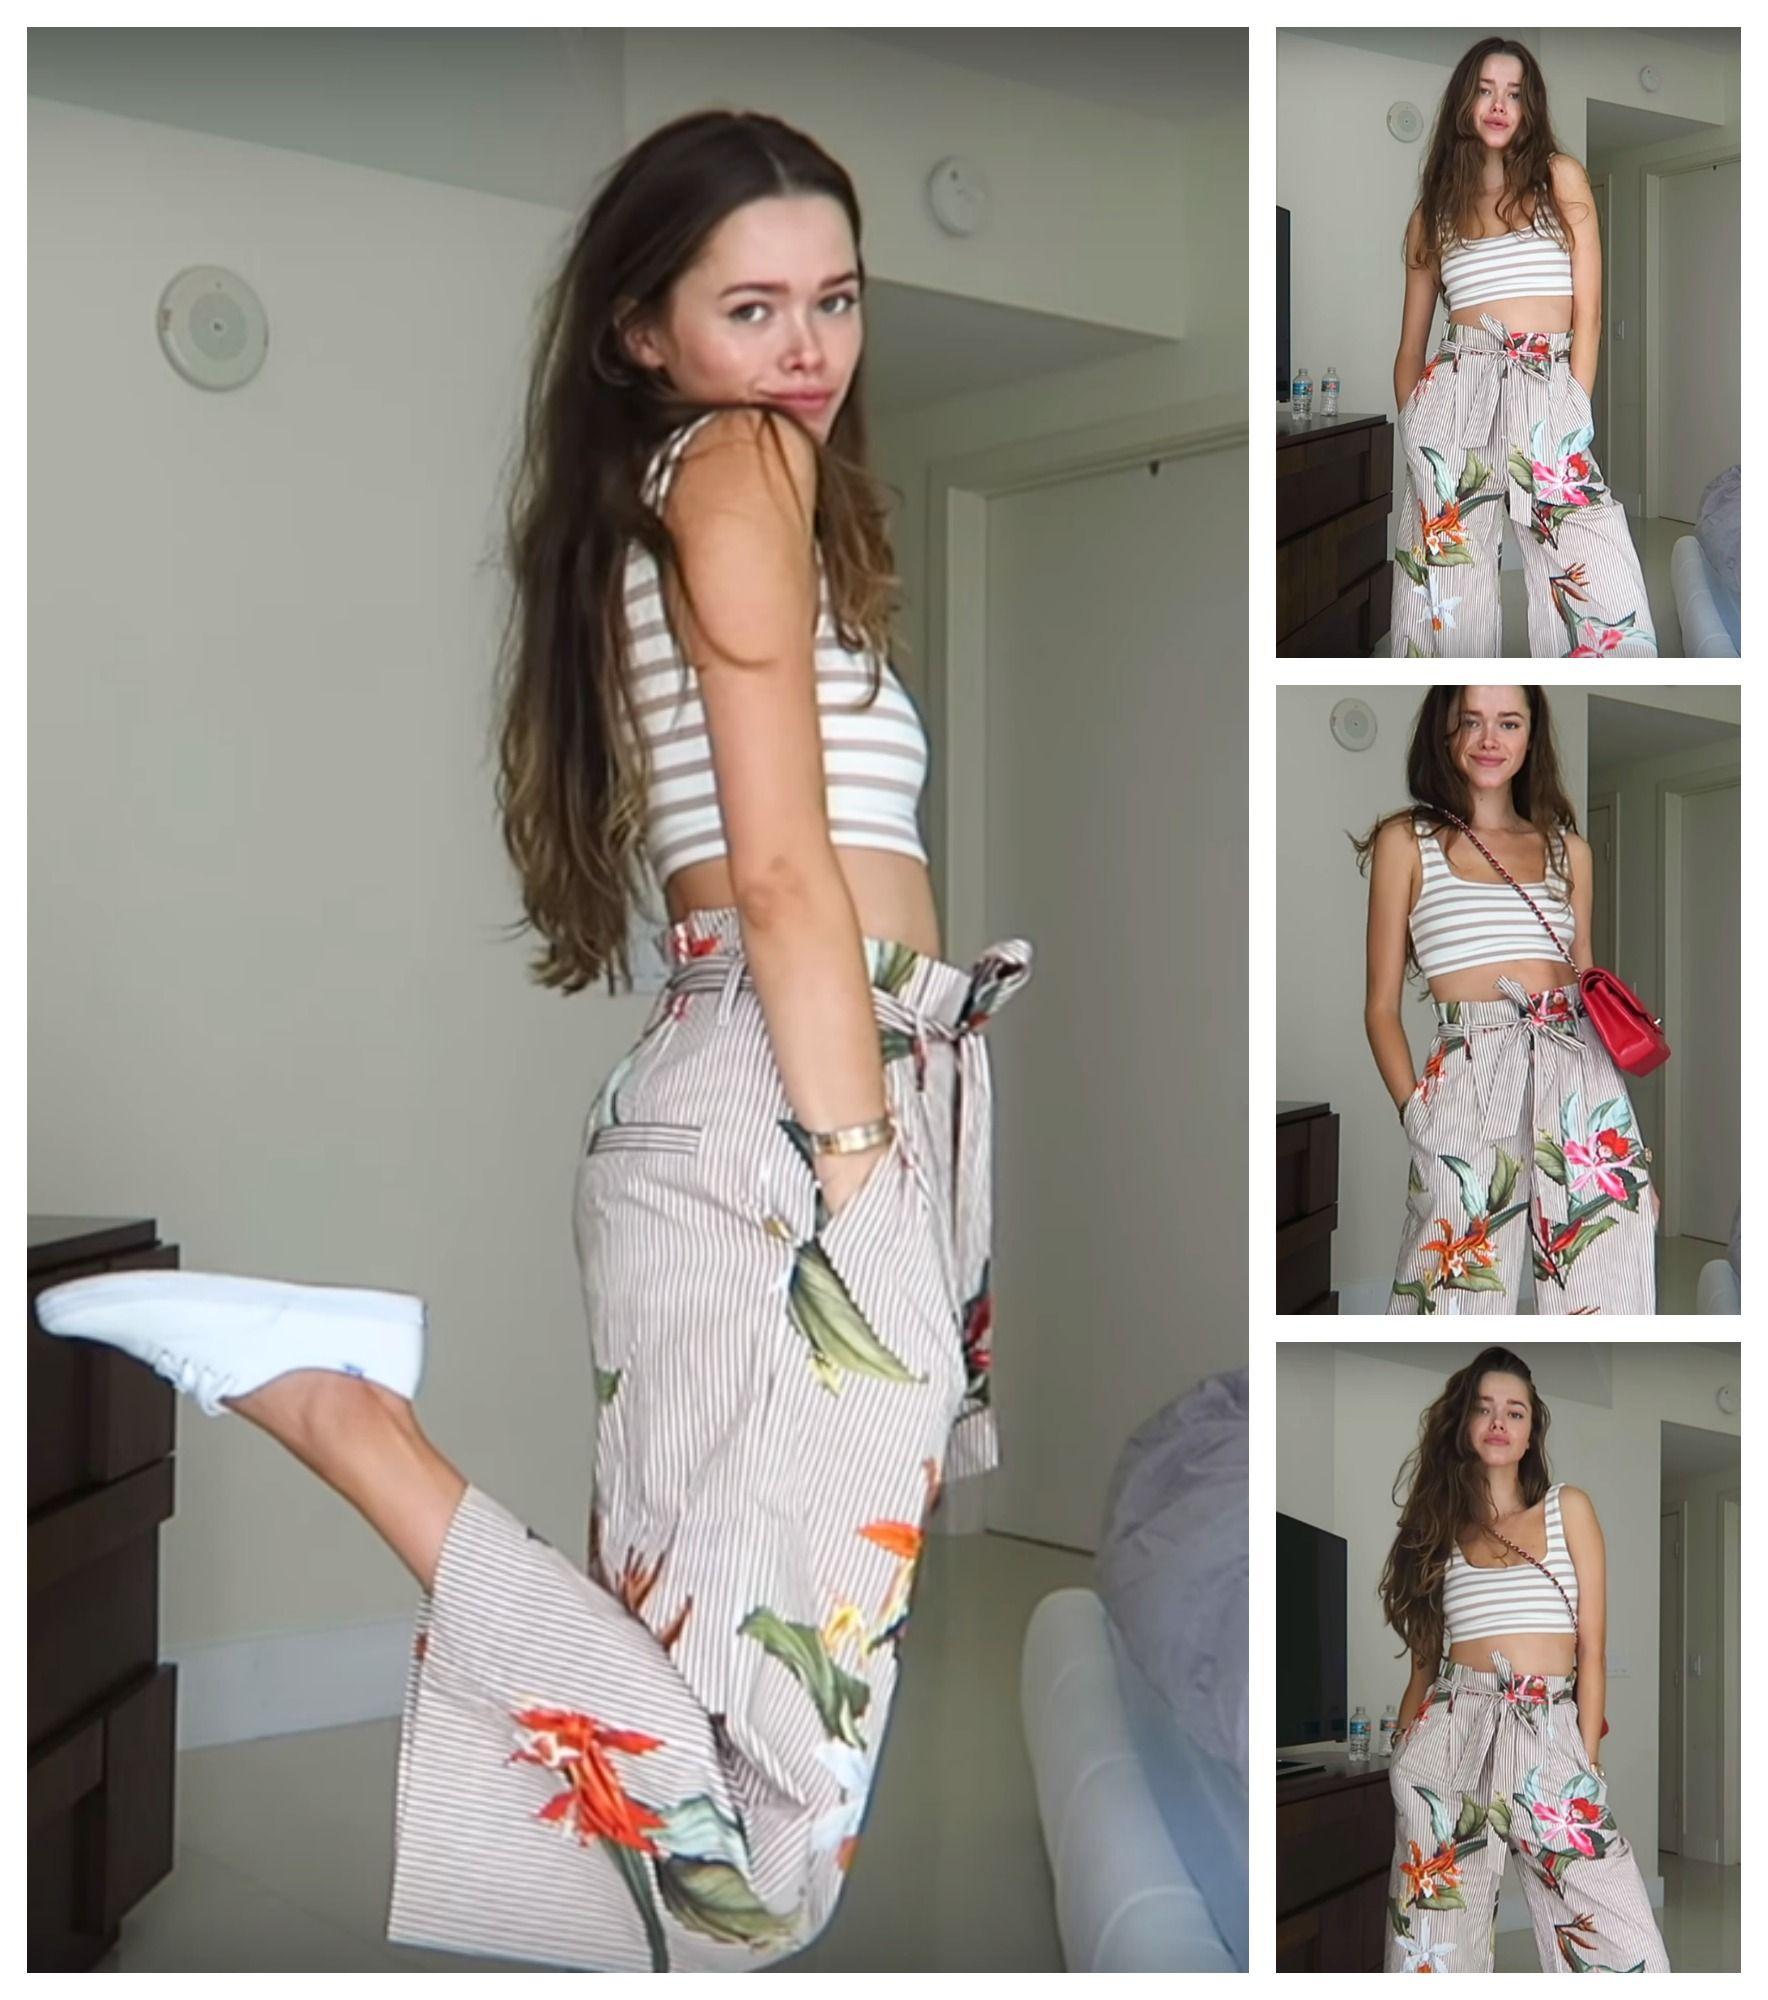 c5d90fa31ac4 valeria lipovetsky lookbook #youtube #fashion #model | Style in 2019 ...